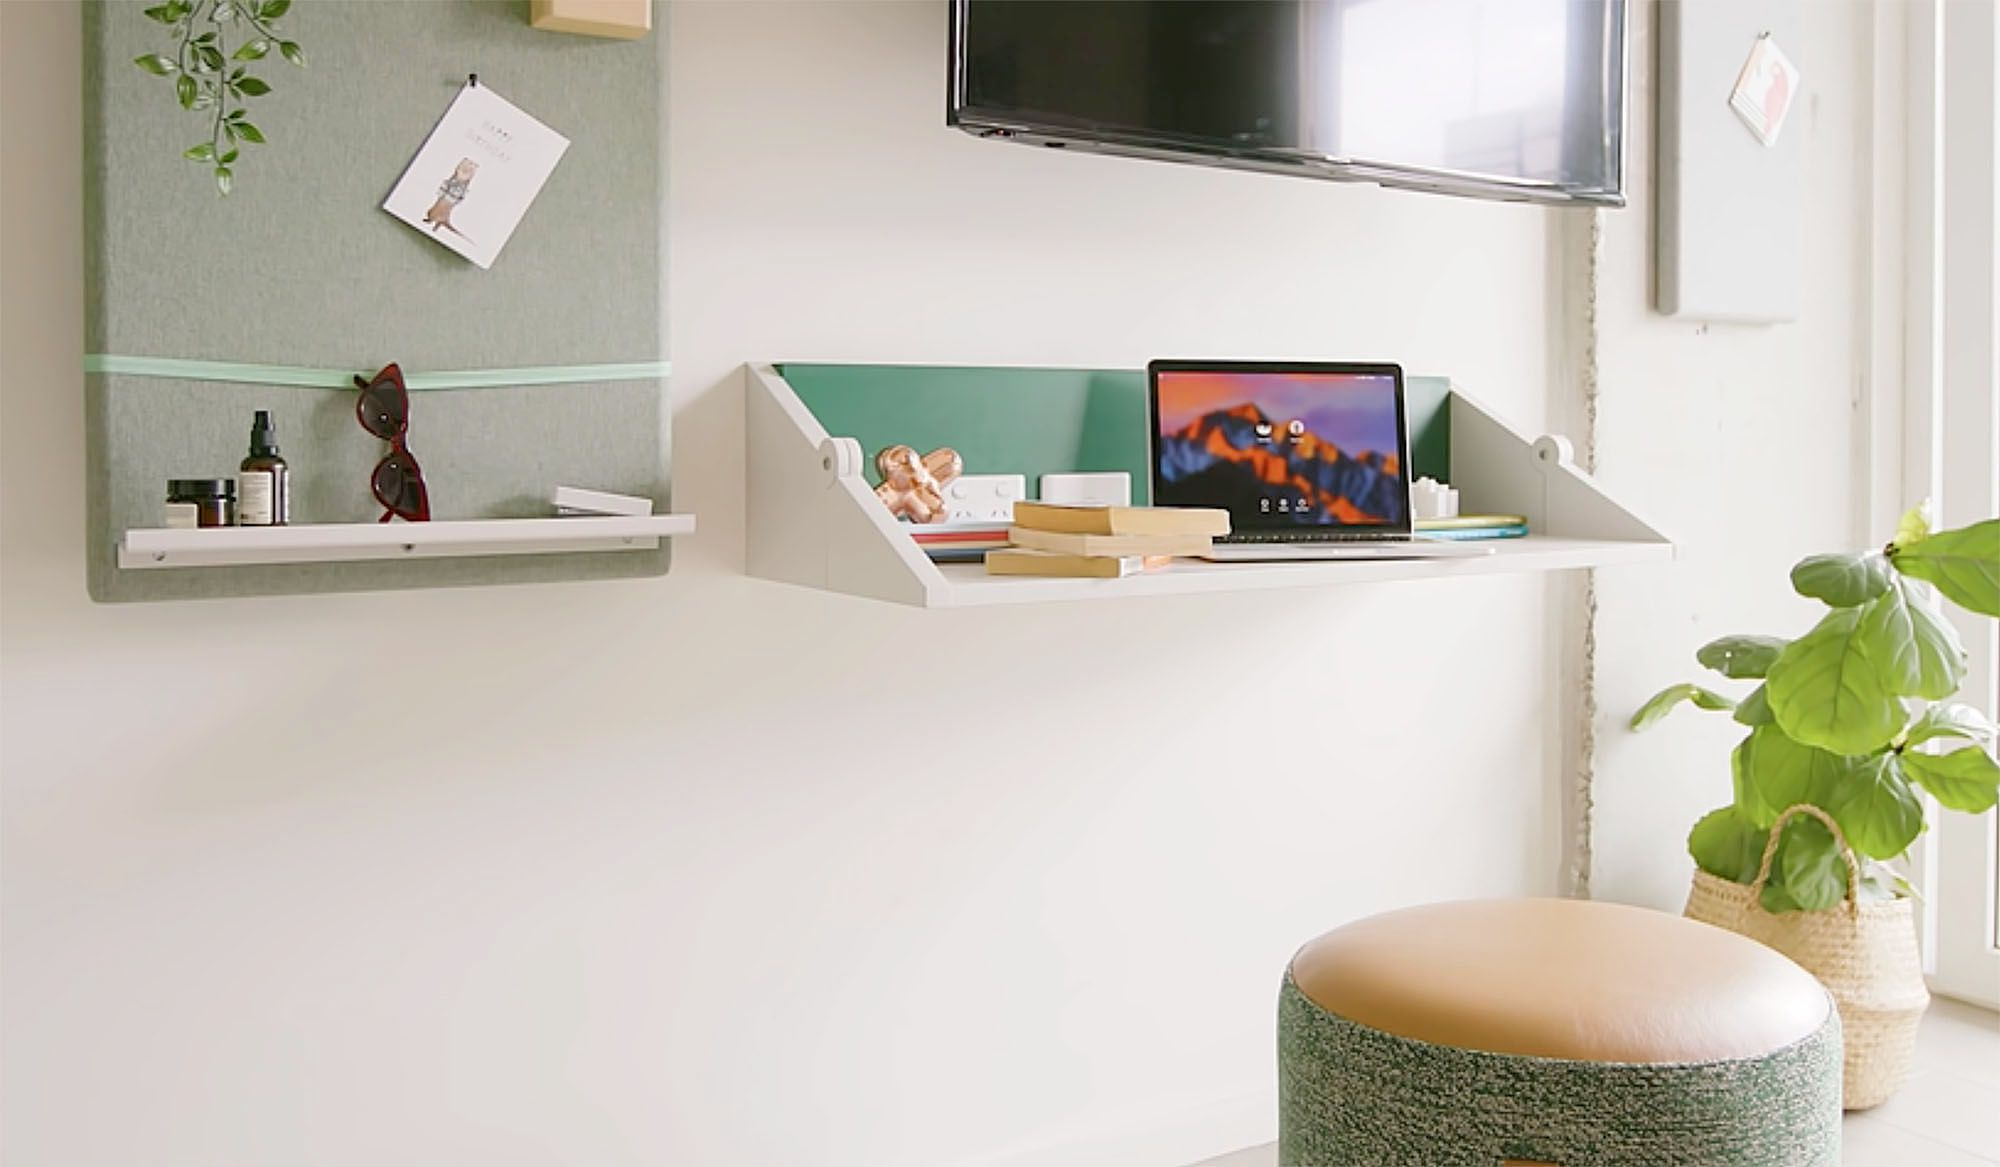 UKO stanmore coliving micro-apartment Mostaghim Associates desk